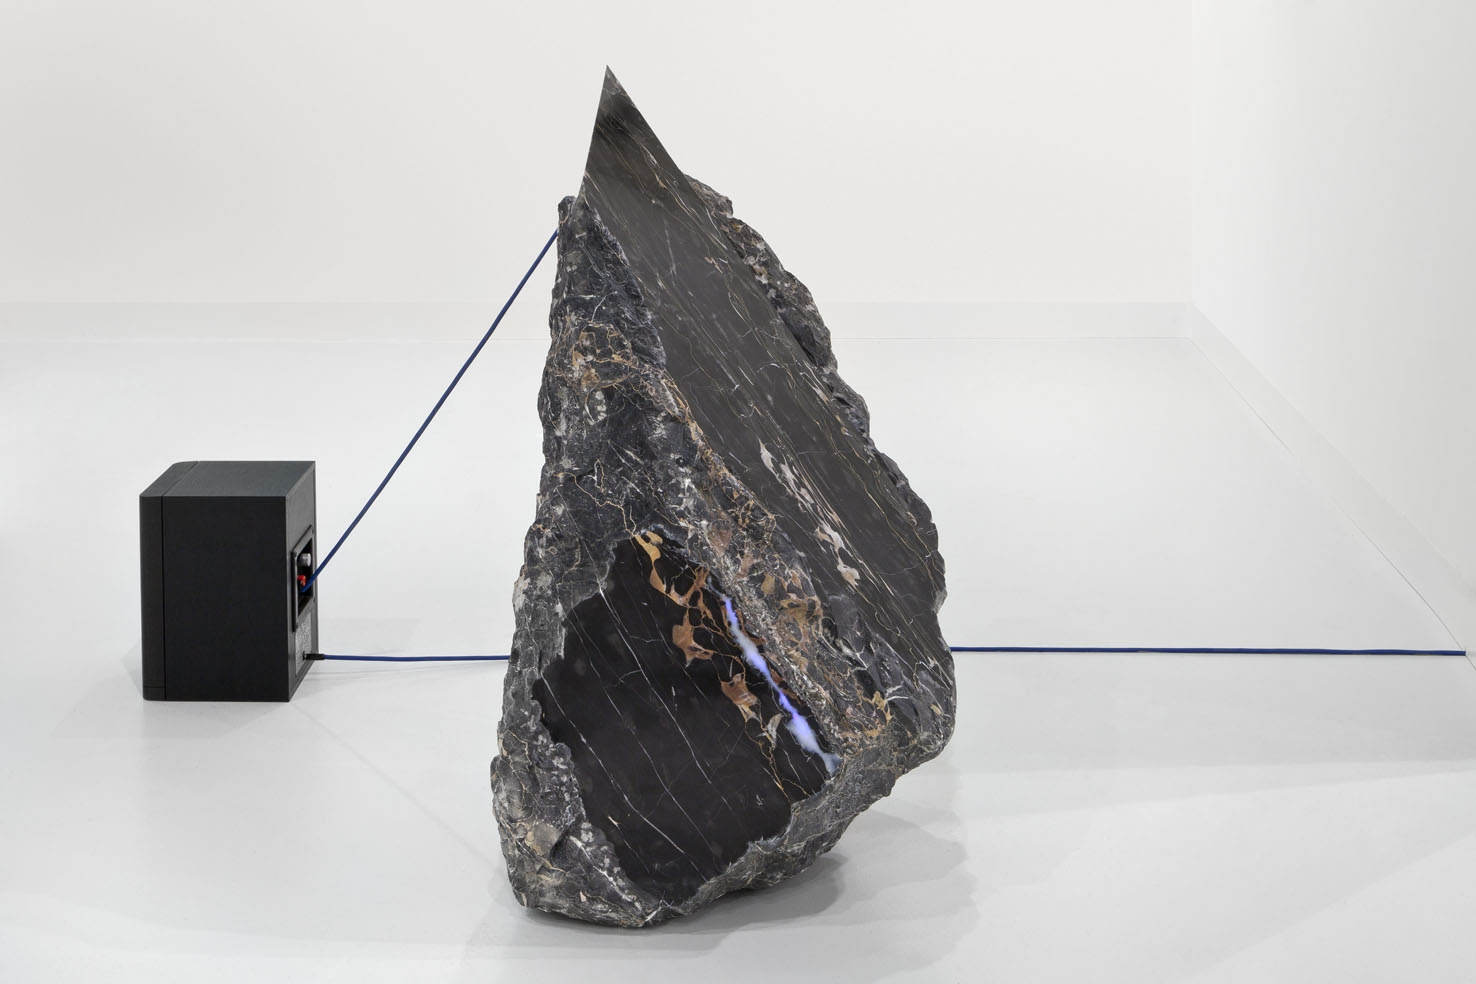 3rd Stone image